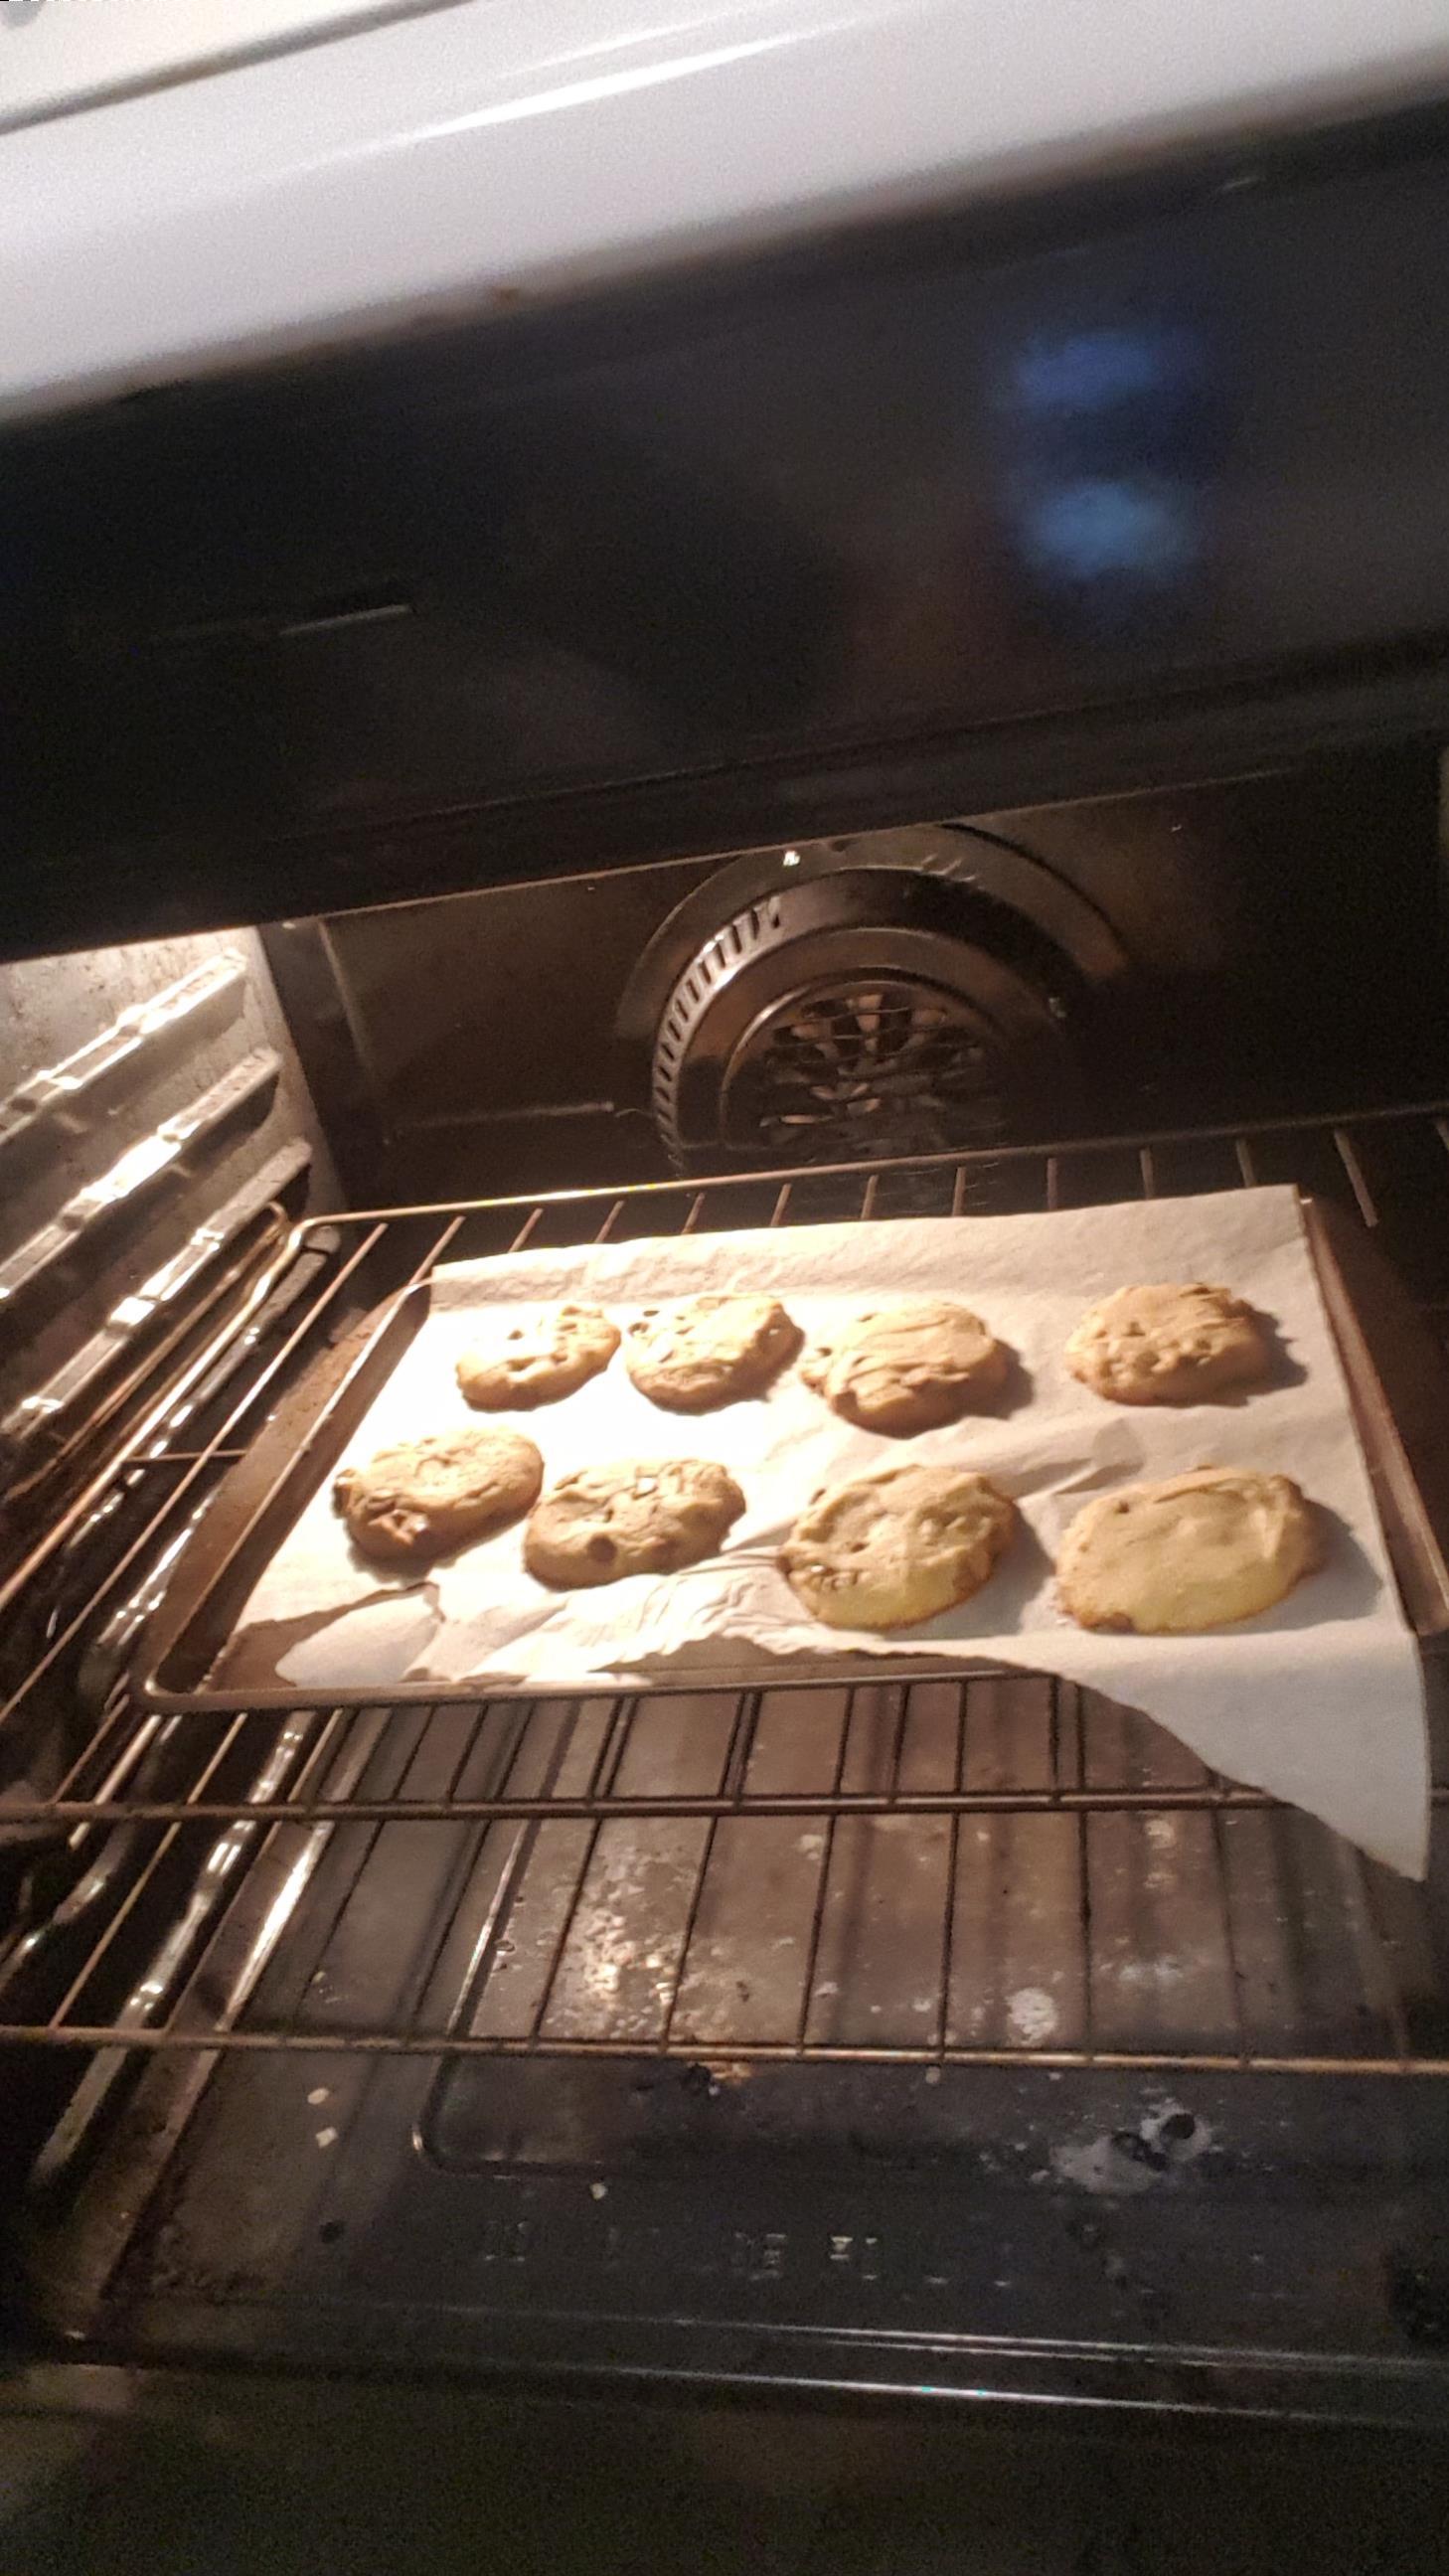 5-Ingredient Easy Chocolate Chip Cookies